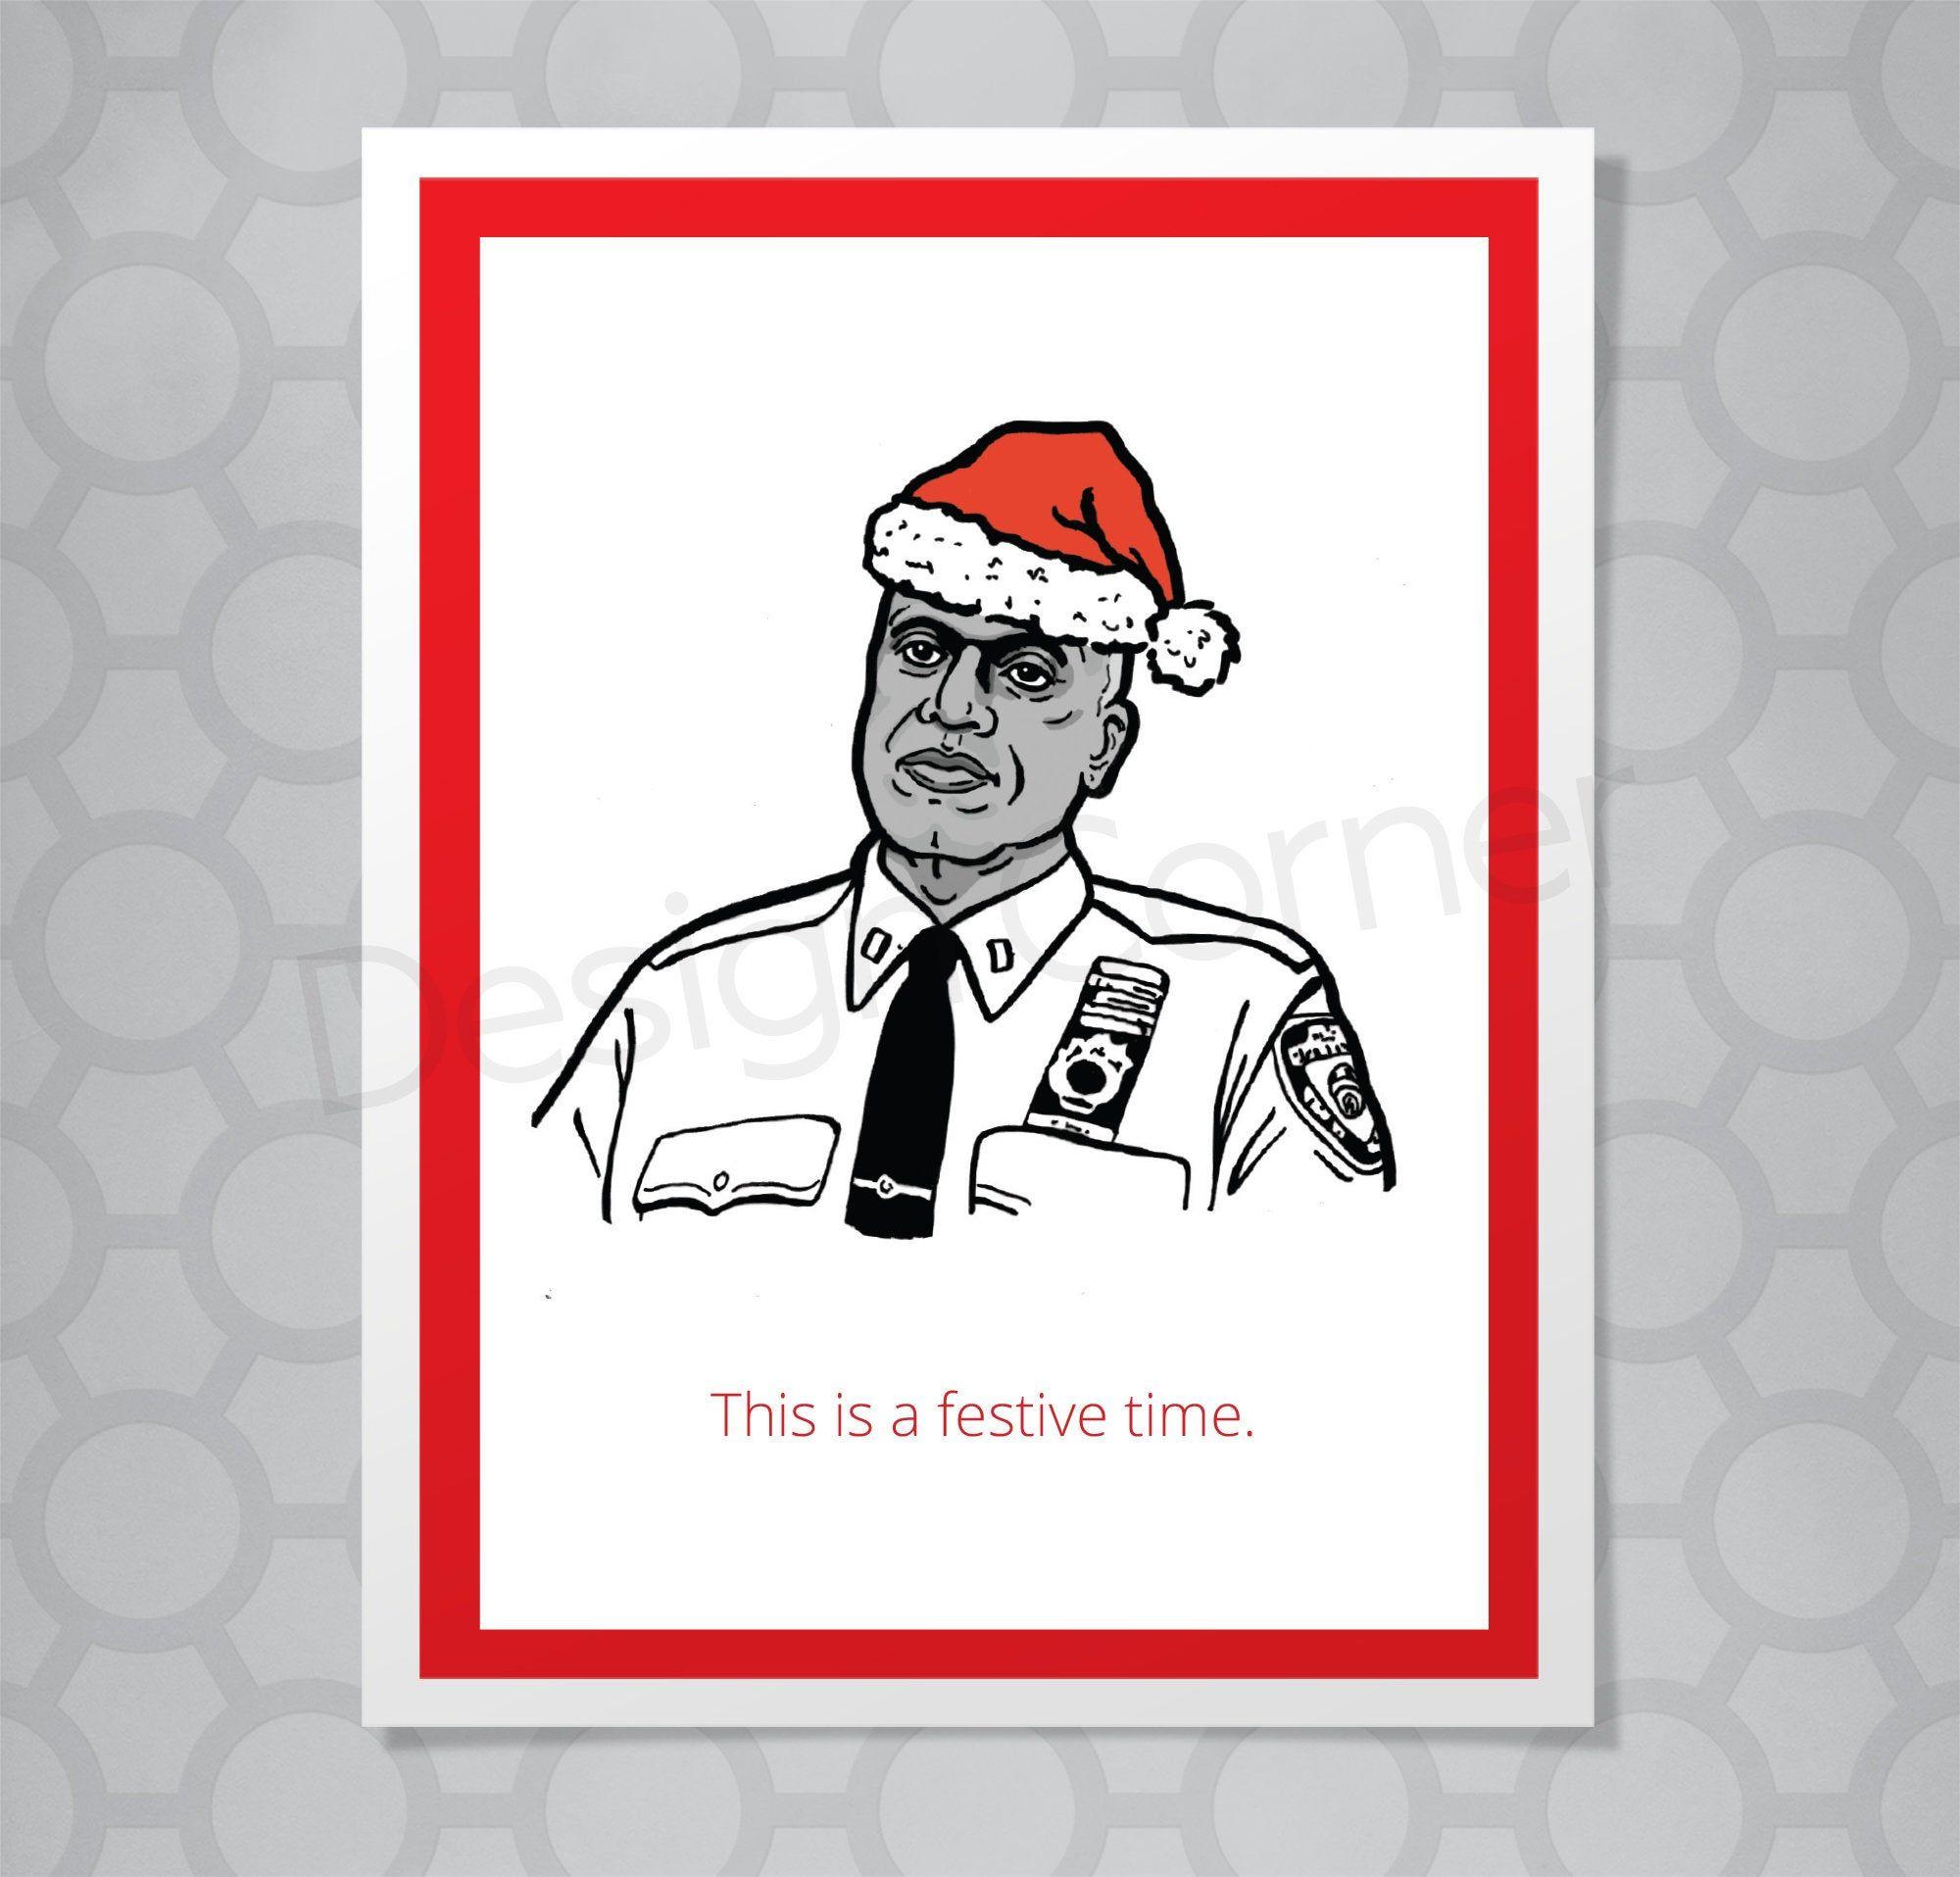 Brooklyn Nine Nine Christmas 2020 Brooklyn Nine Nine Captain Holt Festive Funny Illustrated   Etsy